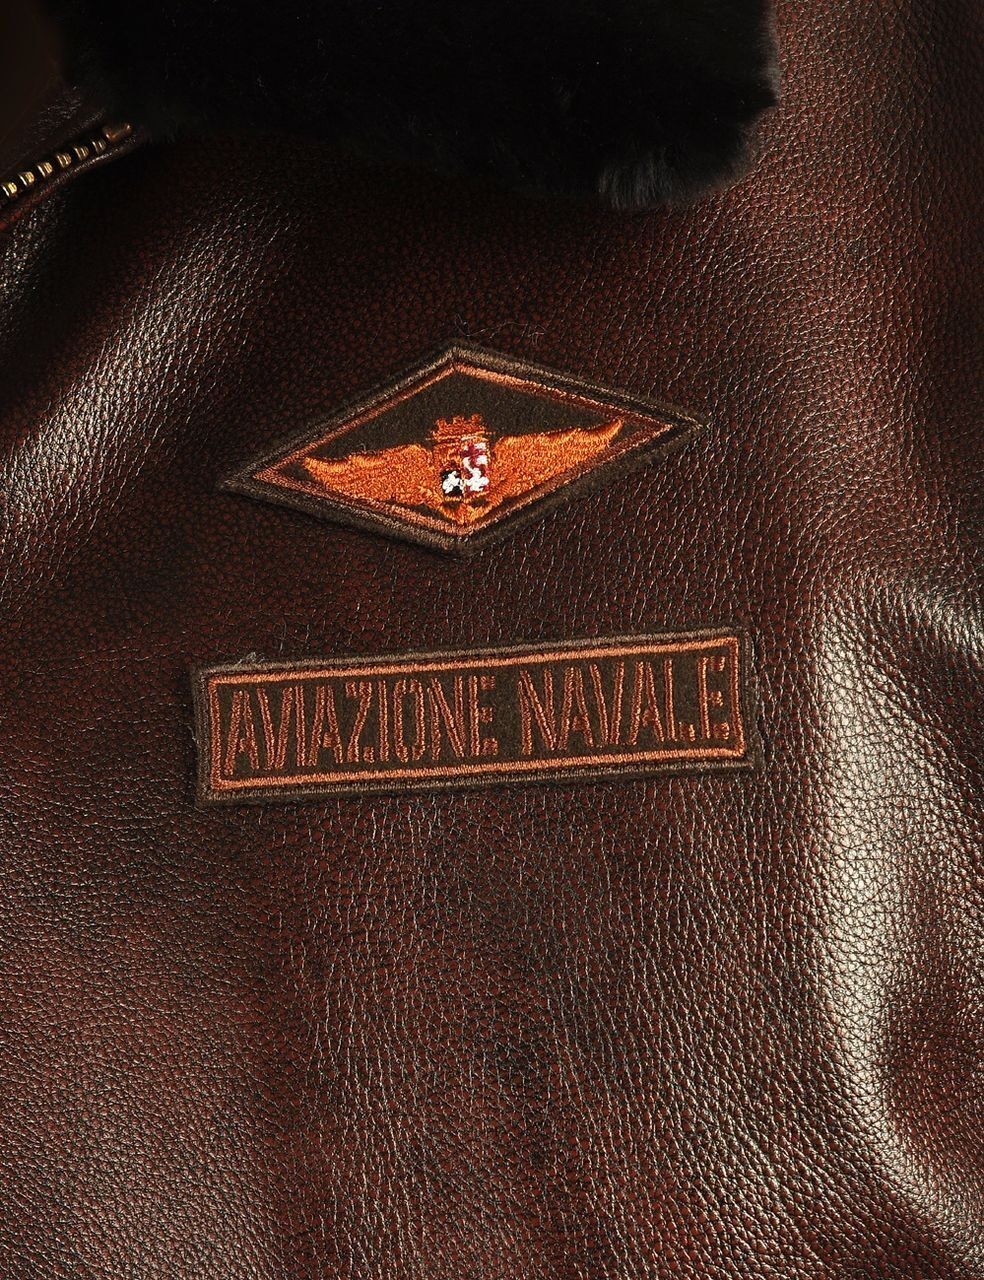 b439cfa8281 Куртка пилотов морской авиации Италии G-1 Marina Militare